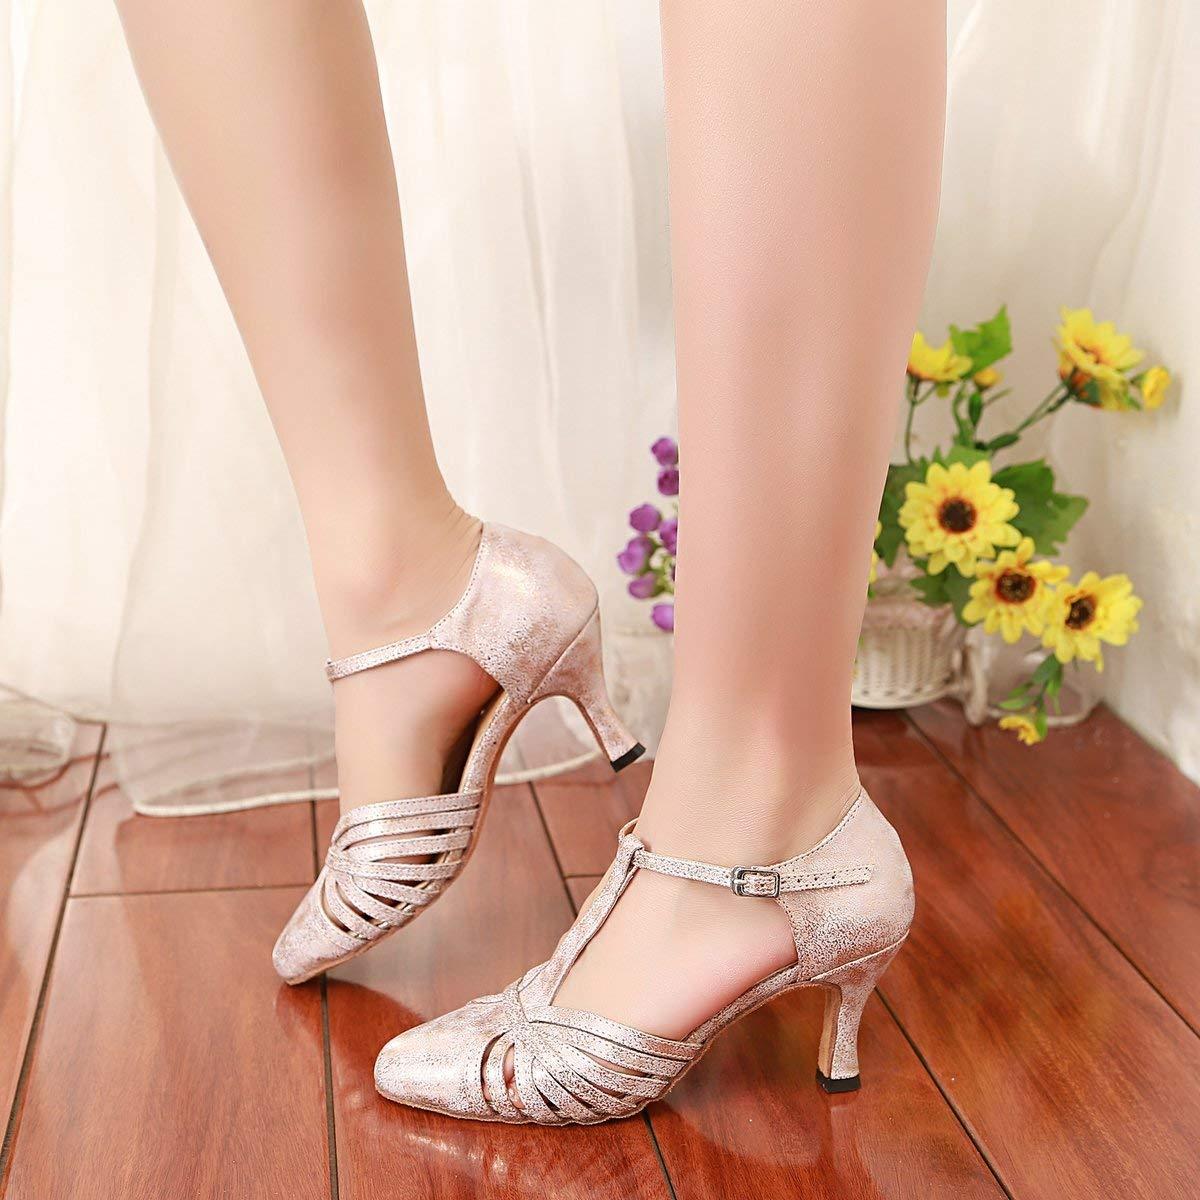 Qiusa GL259 GL259 GL259 Frauen T-Strap Mode Synthetische Latin Ballroom Dance Schuhe Party Pumps (Farbe   Rosa-7.5cm Heel Größe   2 UK) 99011b